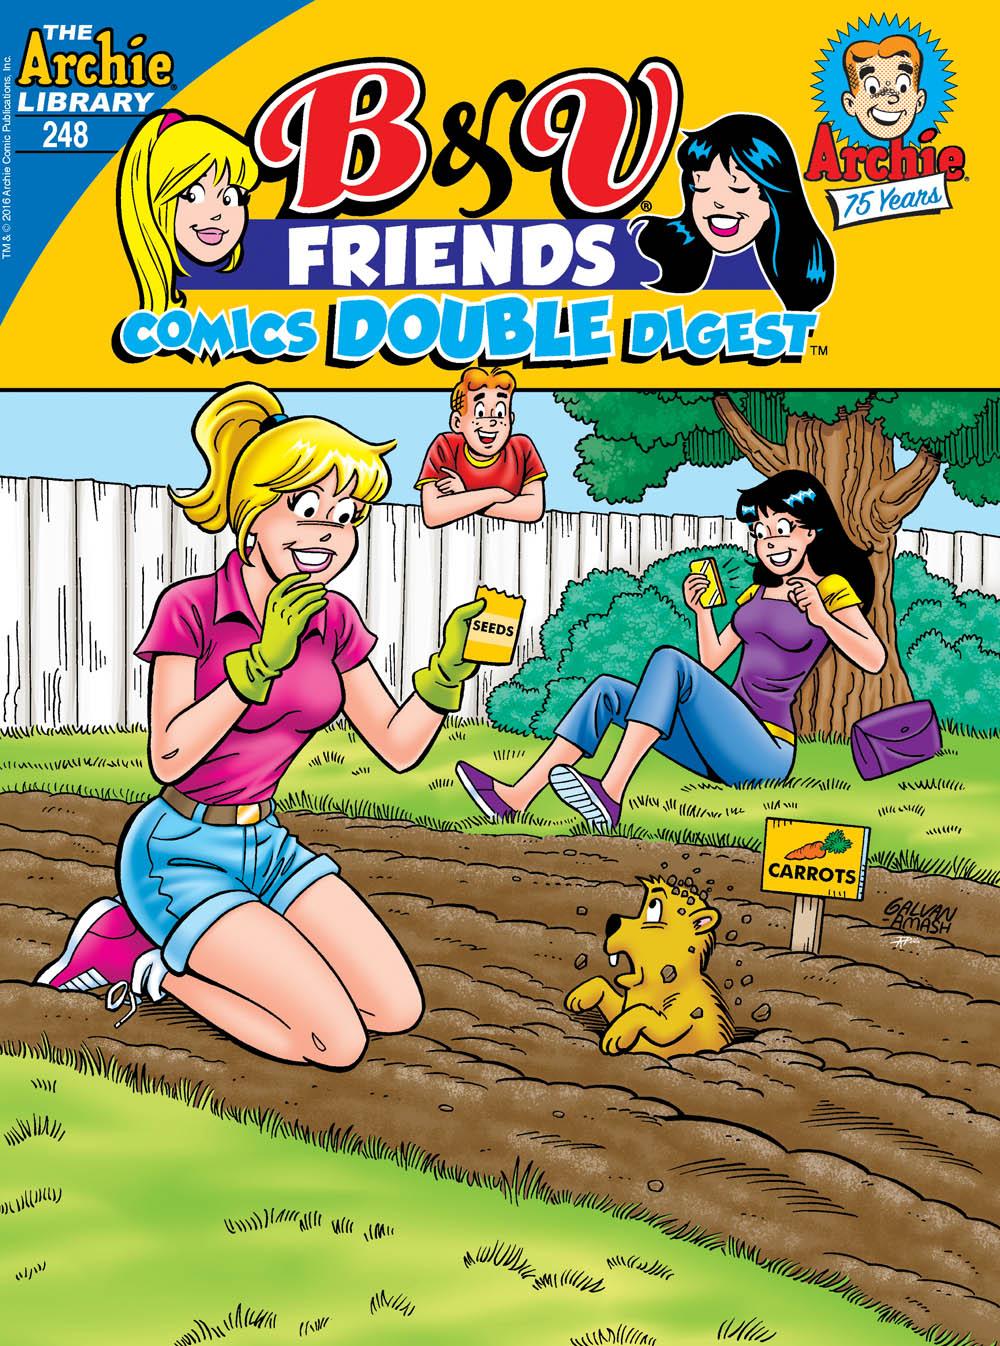 B&V FRIENDS COMICS DOUBLE DIGEST #248 Cover